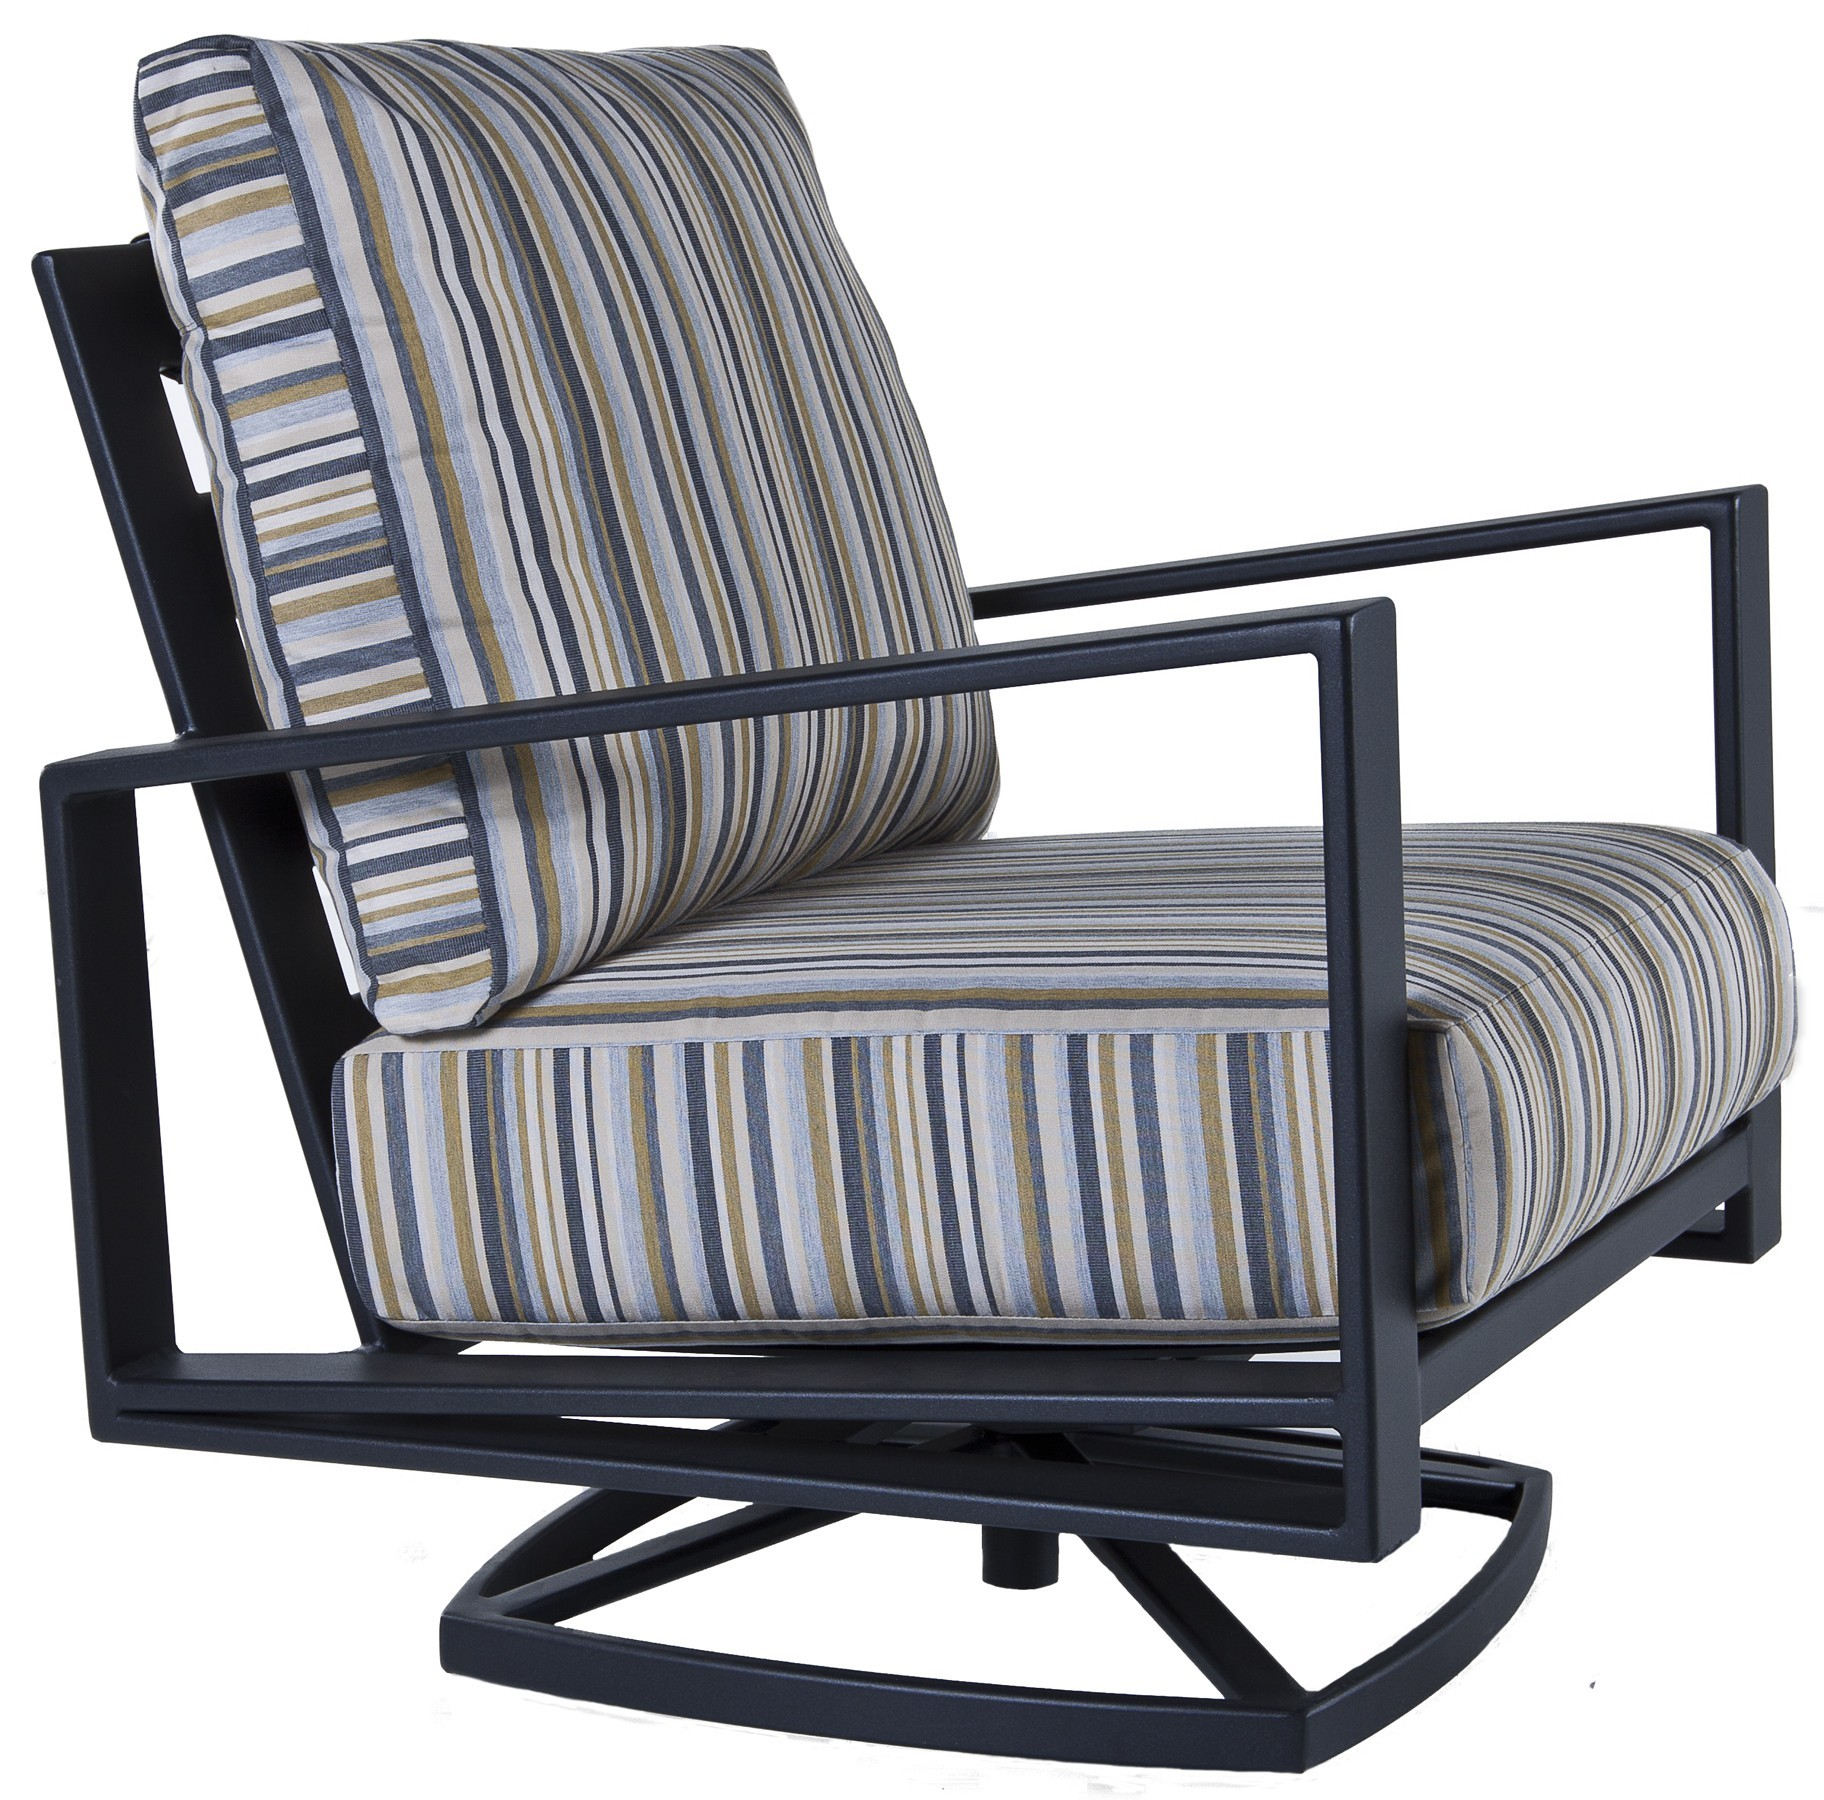 Gios Swivel Rocker Lounge Chair - Hauser's Patio